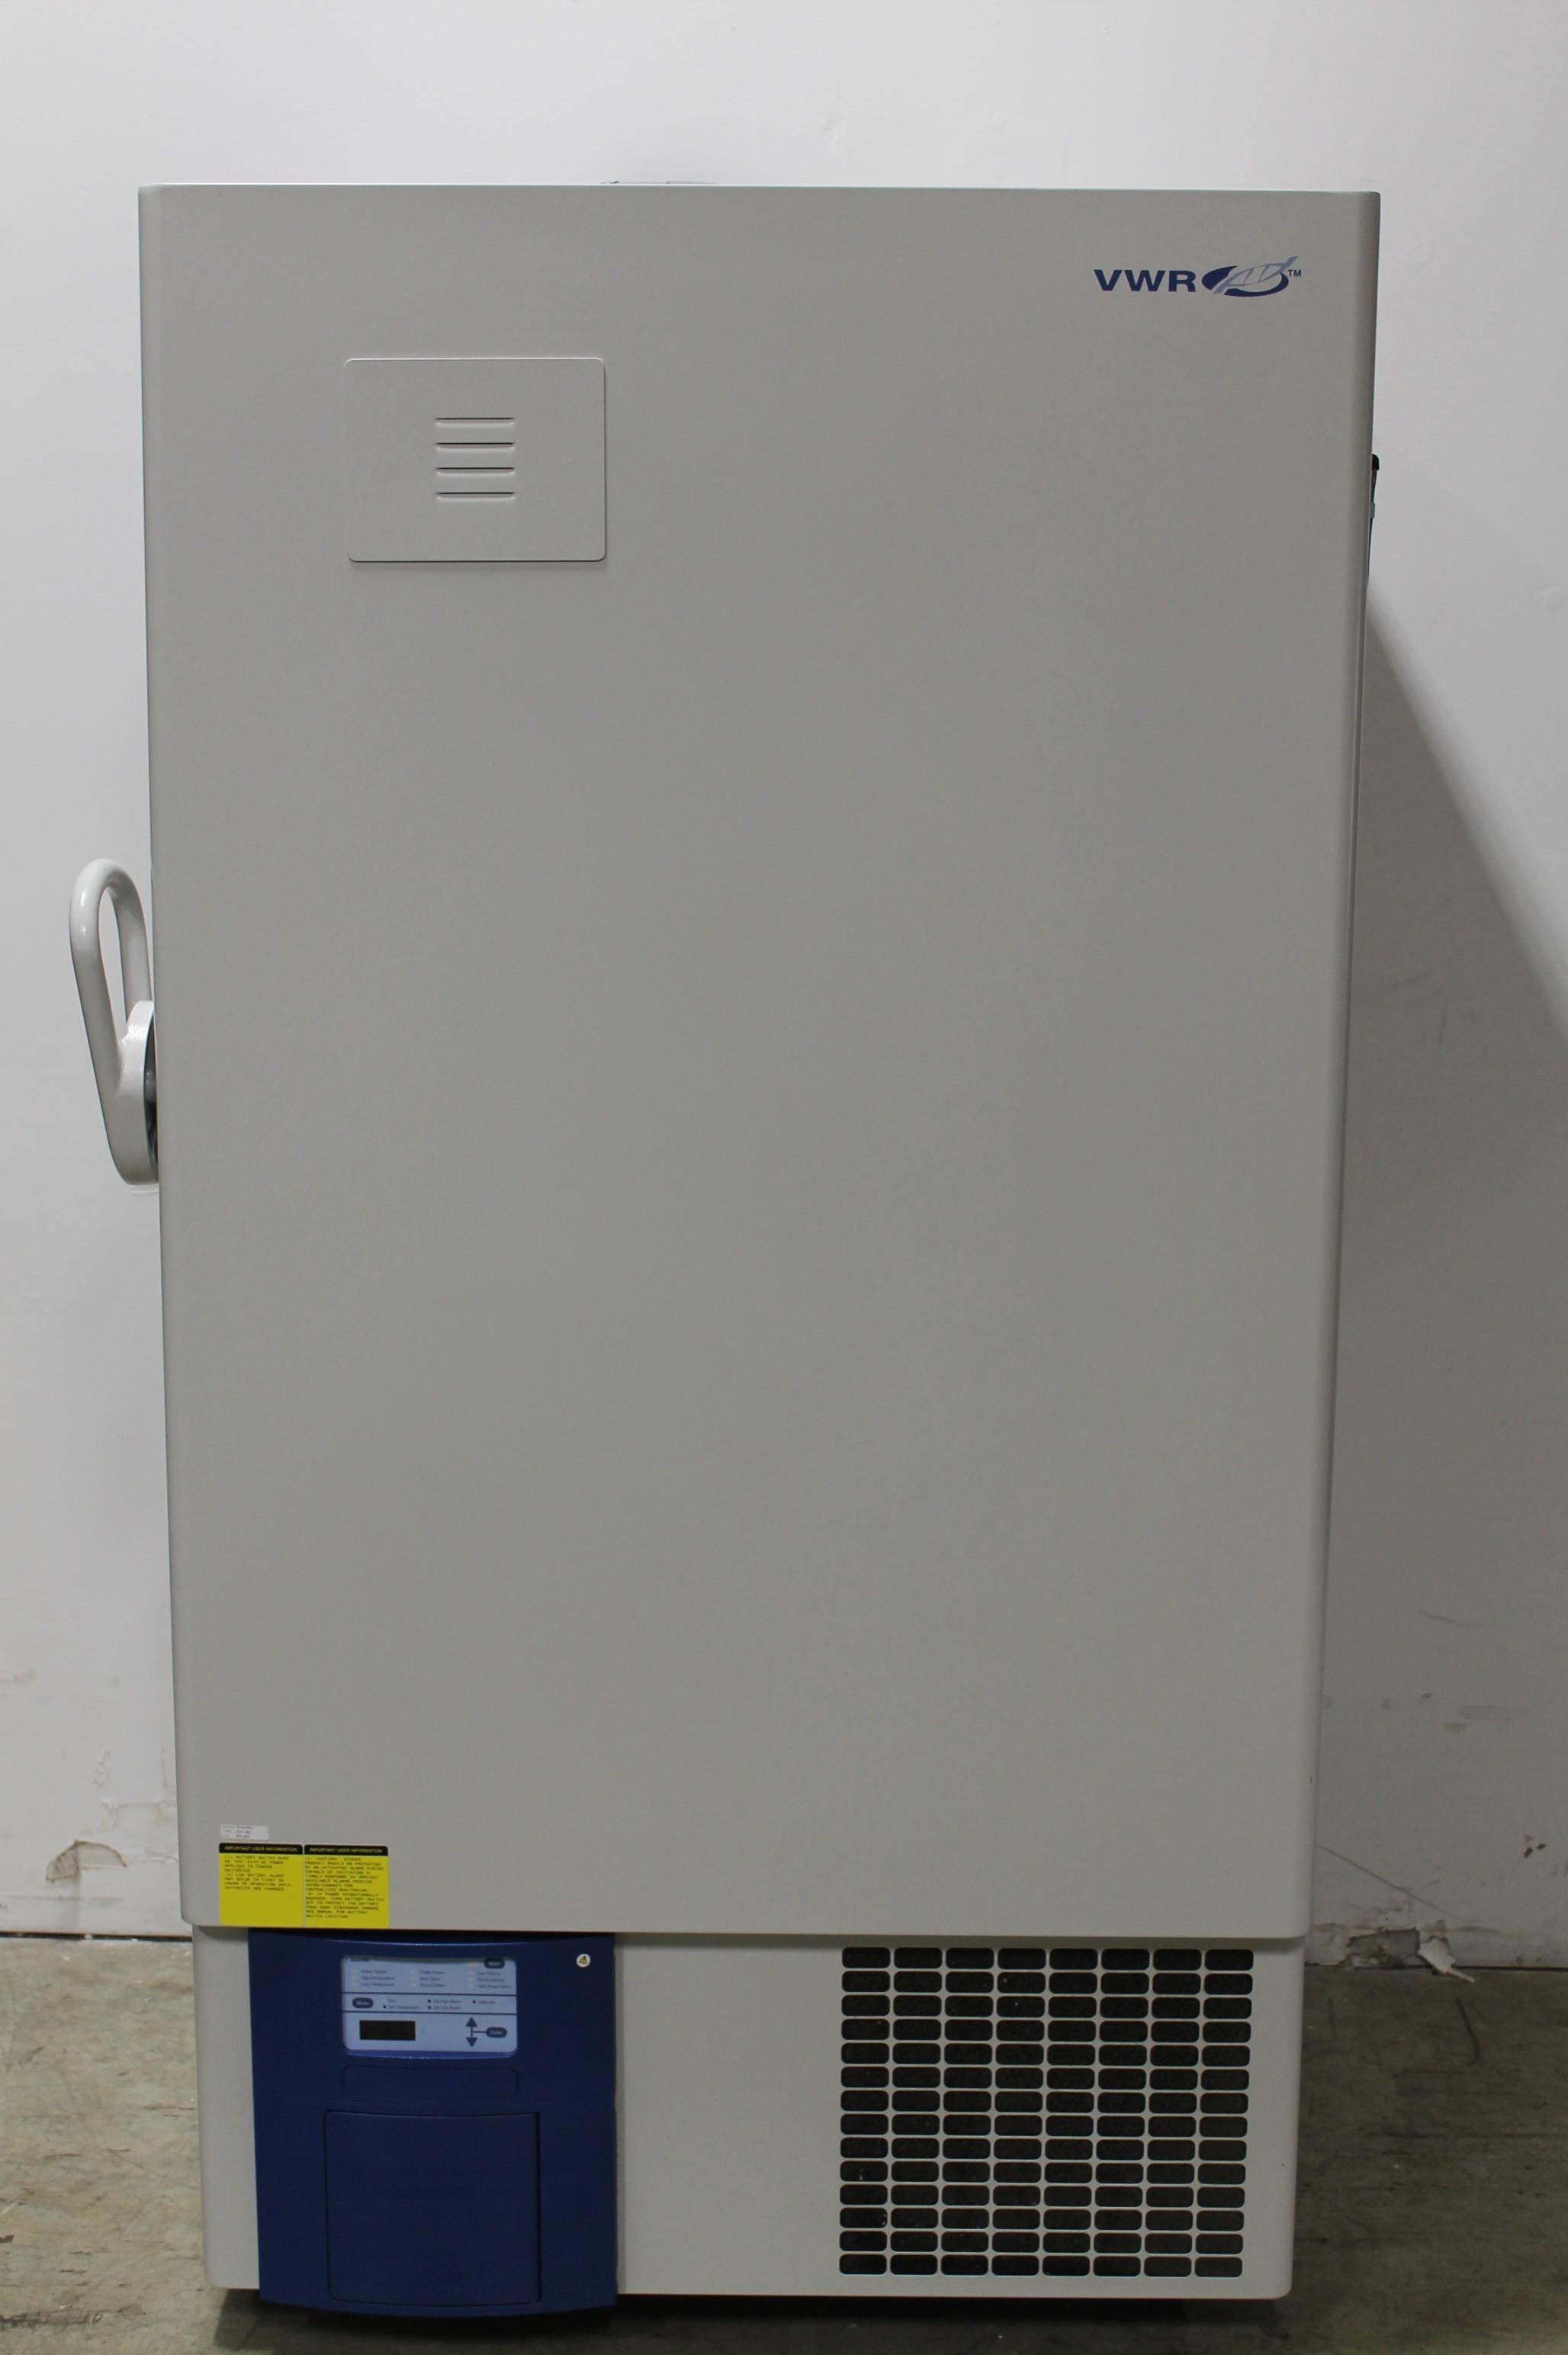 Refurbished Vwr 5756 86 Ultra Low Refrigerator Freezer